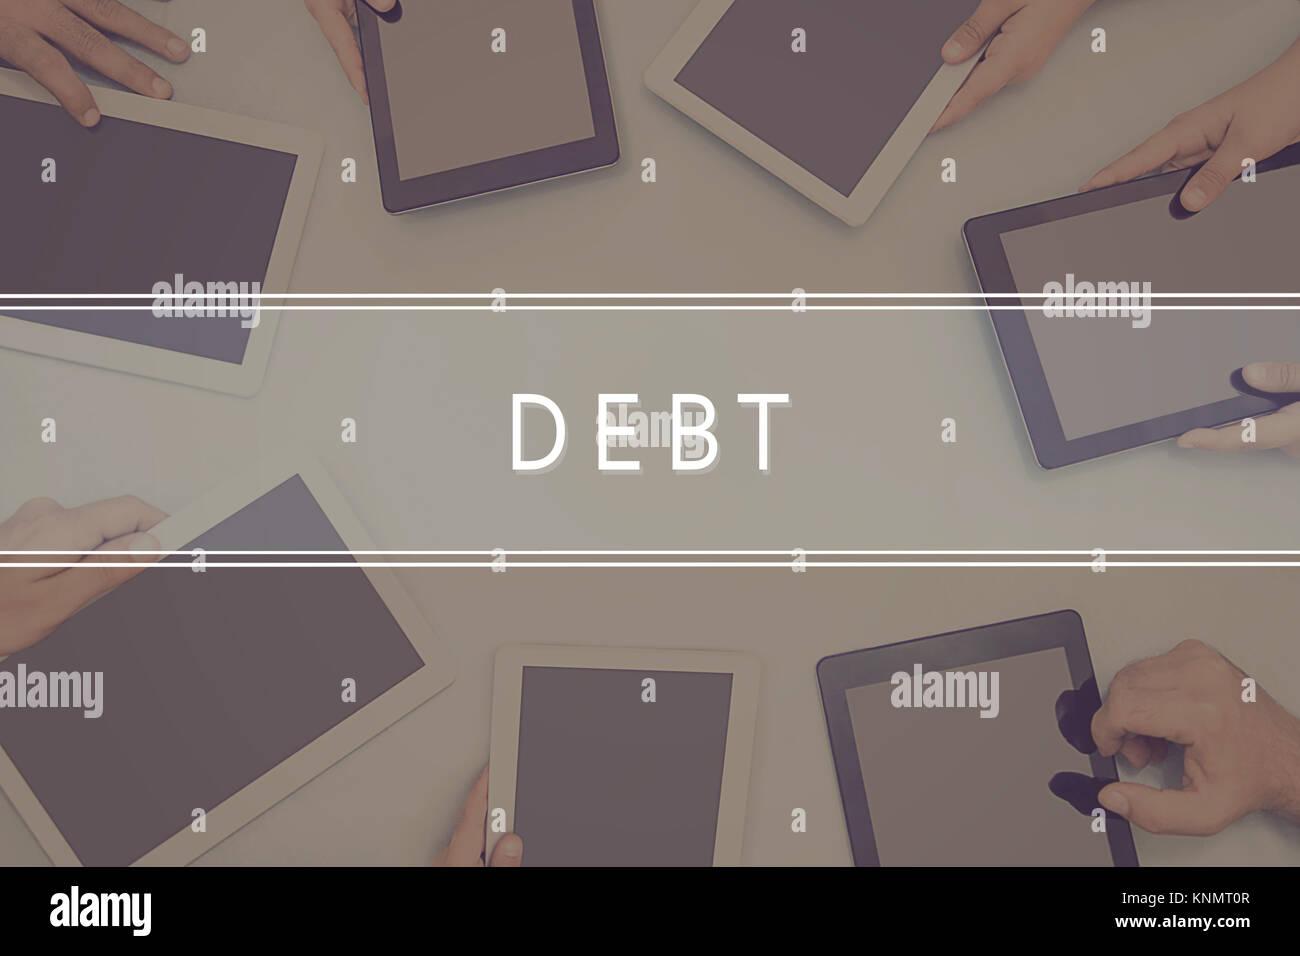 DEBT CONCEPT Business Concept. - Stock Image